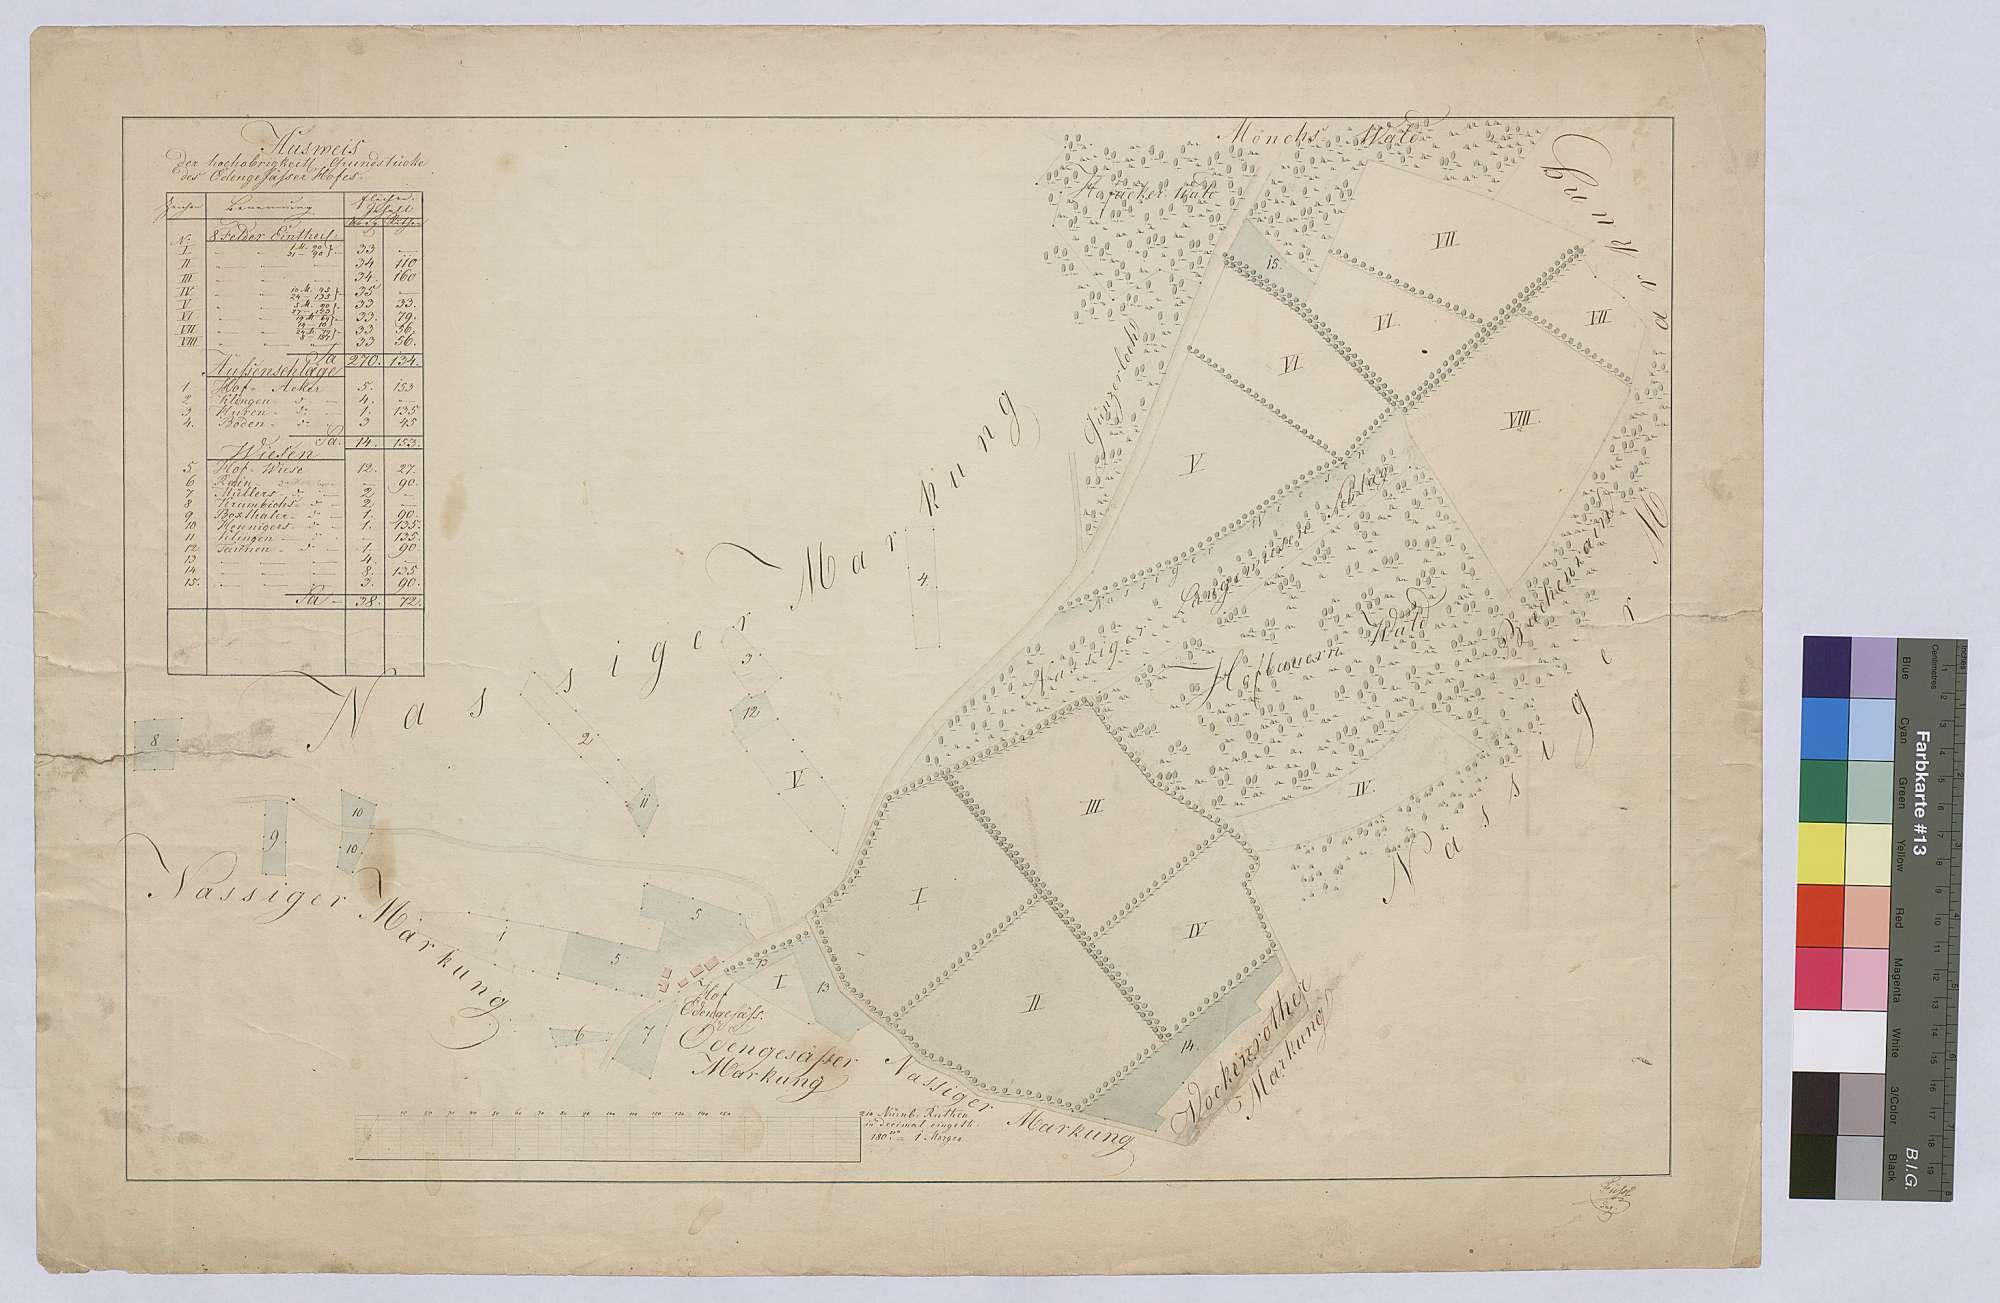 Grundstücke des Ödengesäßer Hofes (Inselkarte), a